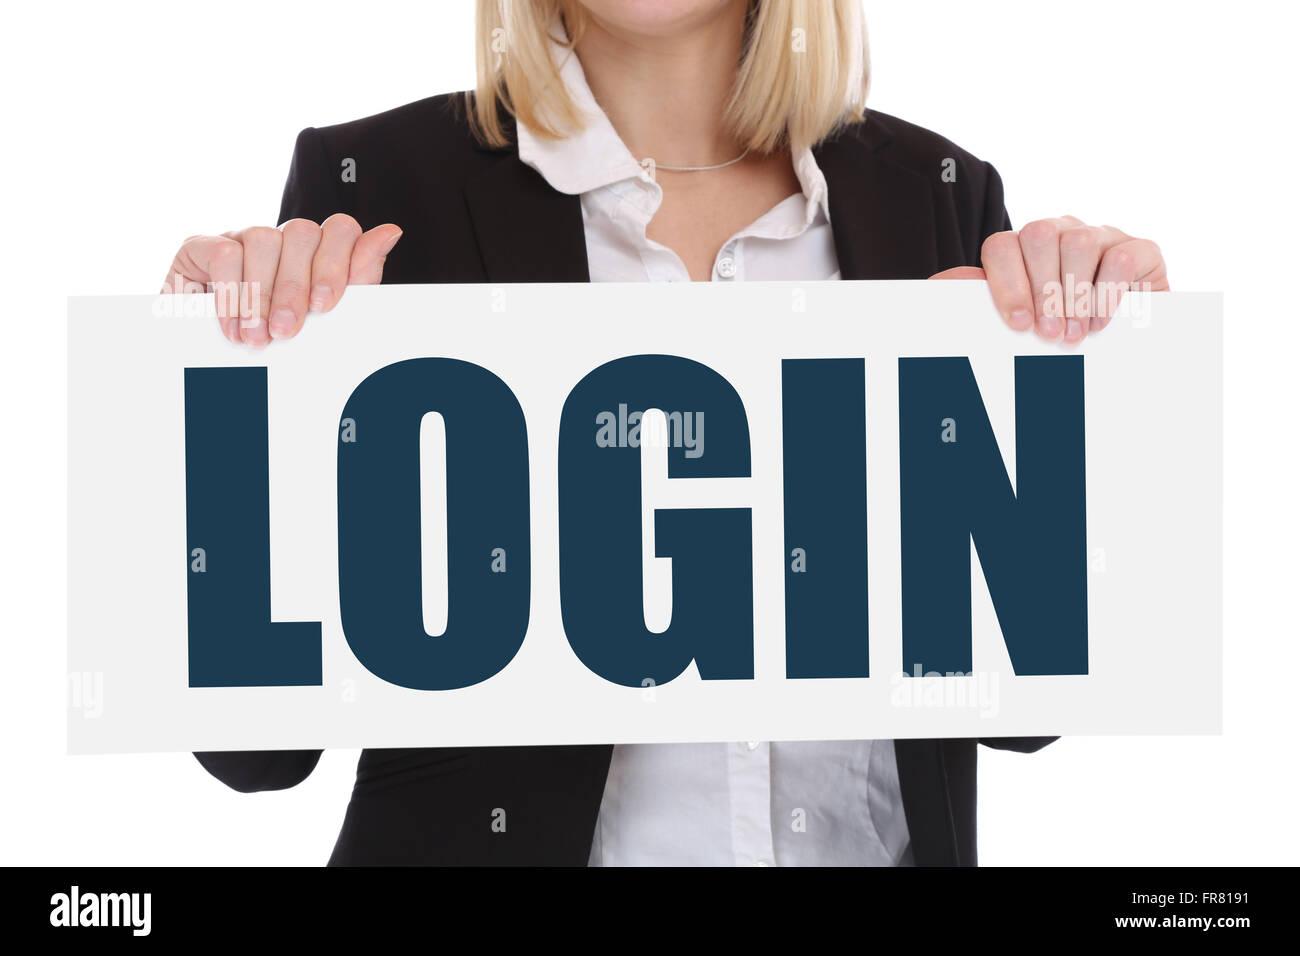 Login register password internet security computer business concept register online - Stock Image